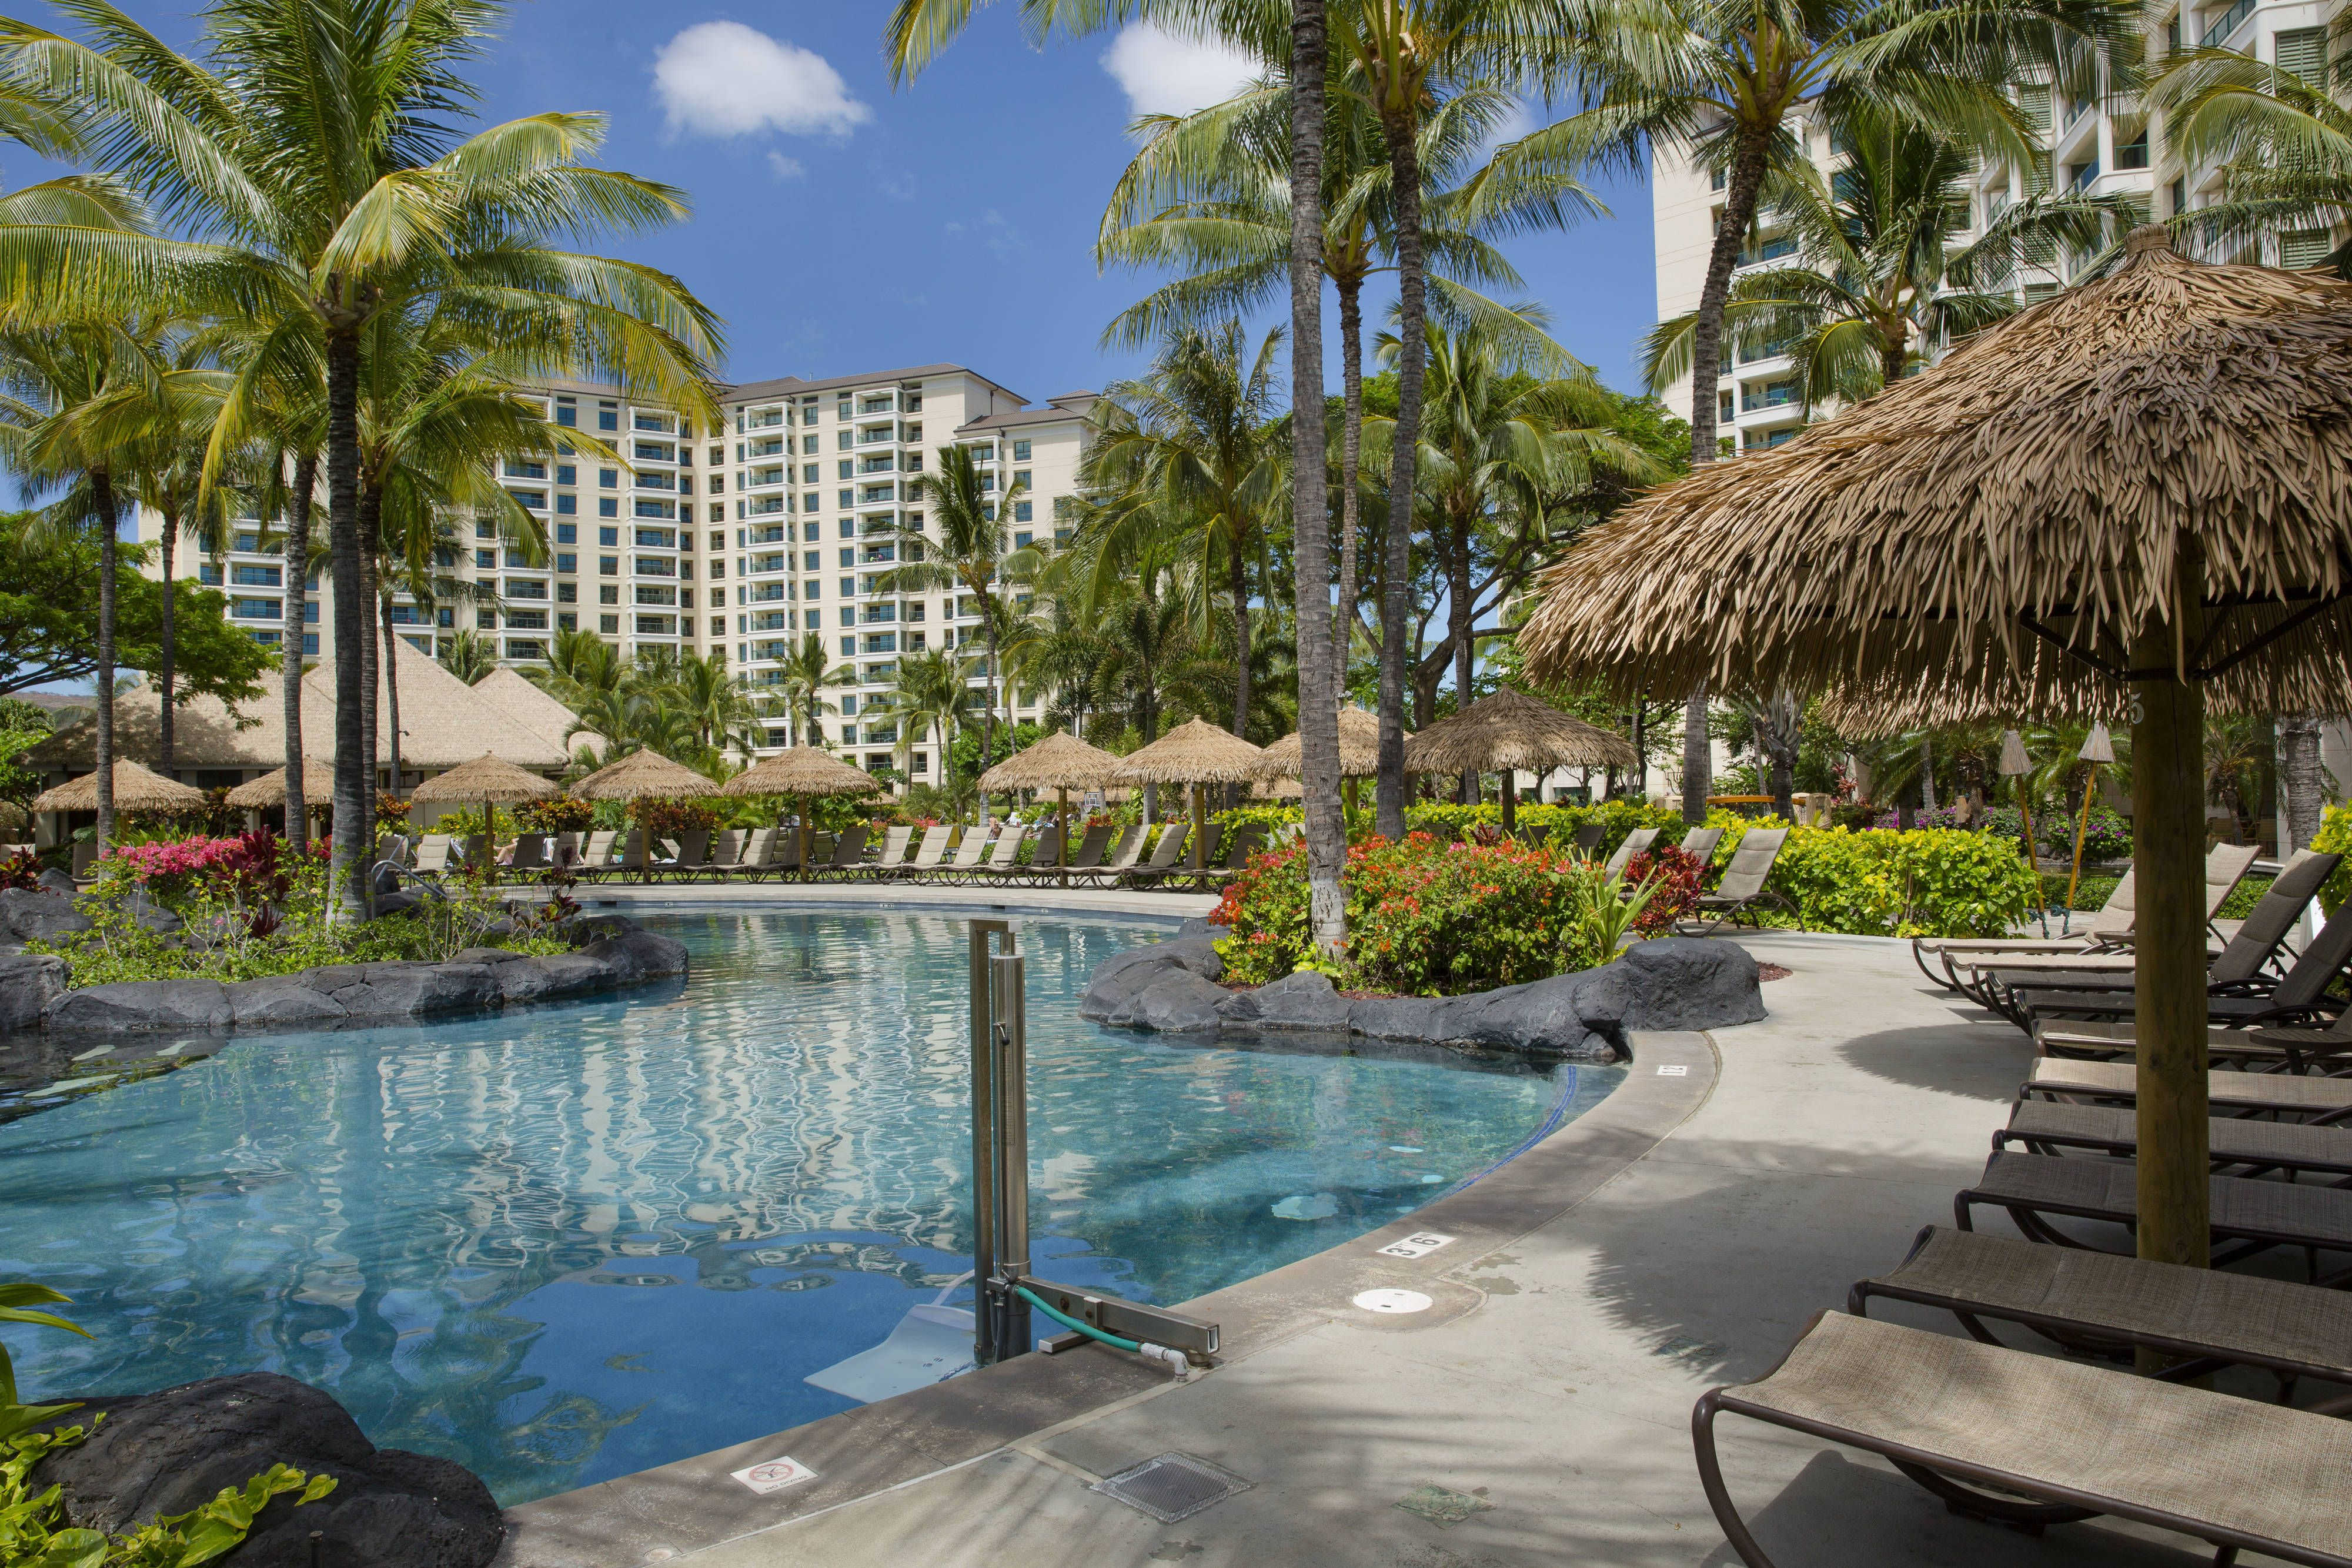 Marriott S Ko Olina Beach Club Quiet Reflections Pool Guestroom Guestroom Guestbathroom Vacation Resorts Marriott Resorts Resort